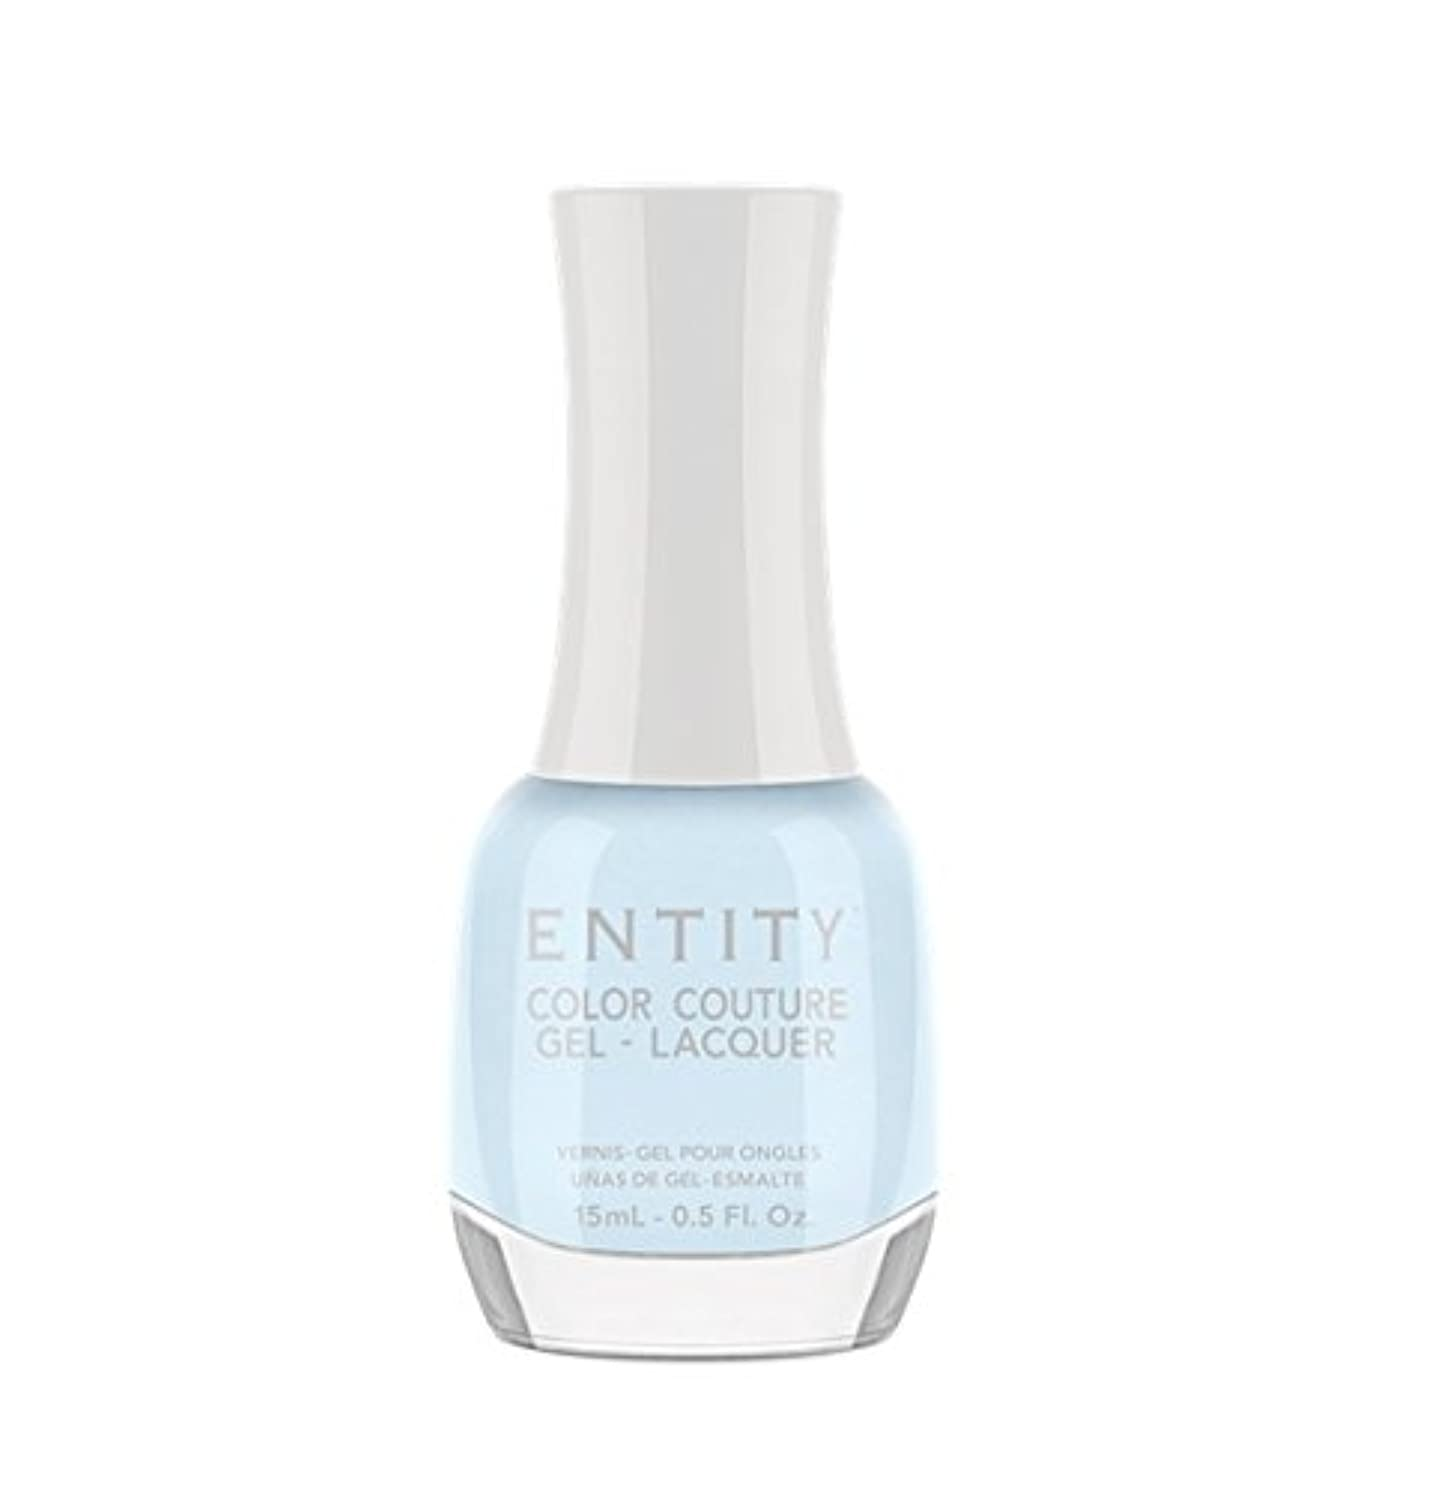 Entity Color Couture Gel-Lacquer - Delicates - 15 ml/0.5 oz